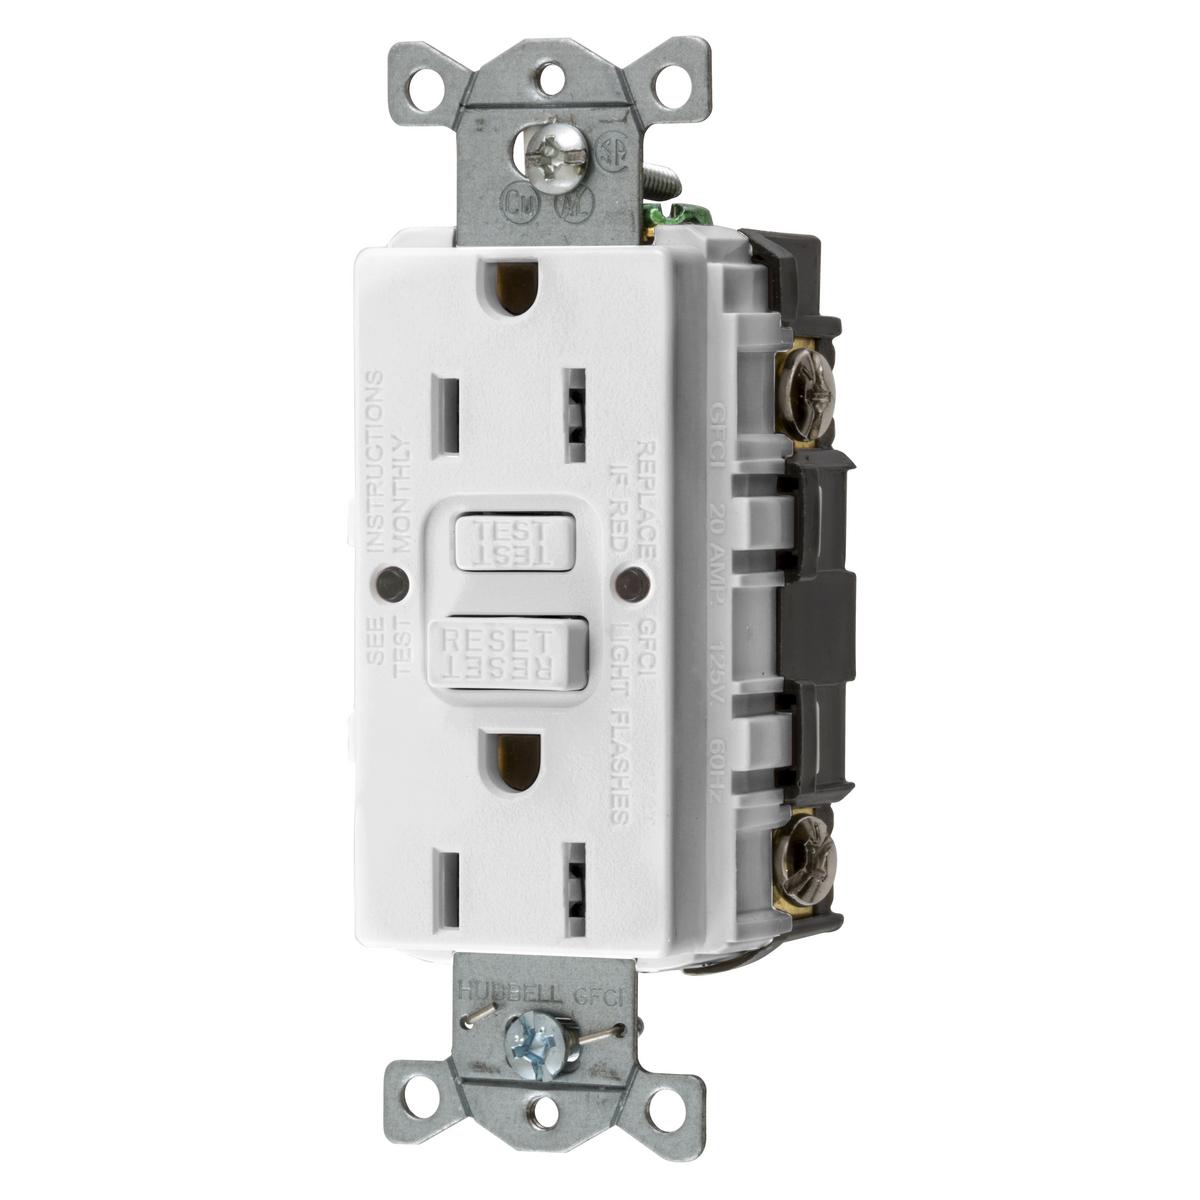 Hubbell GFRST15W 15 Amp 125 Volt 2-Pole 3-Wire NEMA 5-15R White GFCI Receptacle